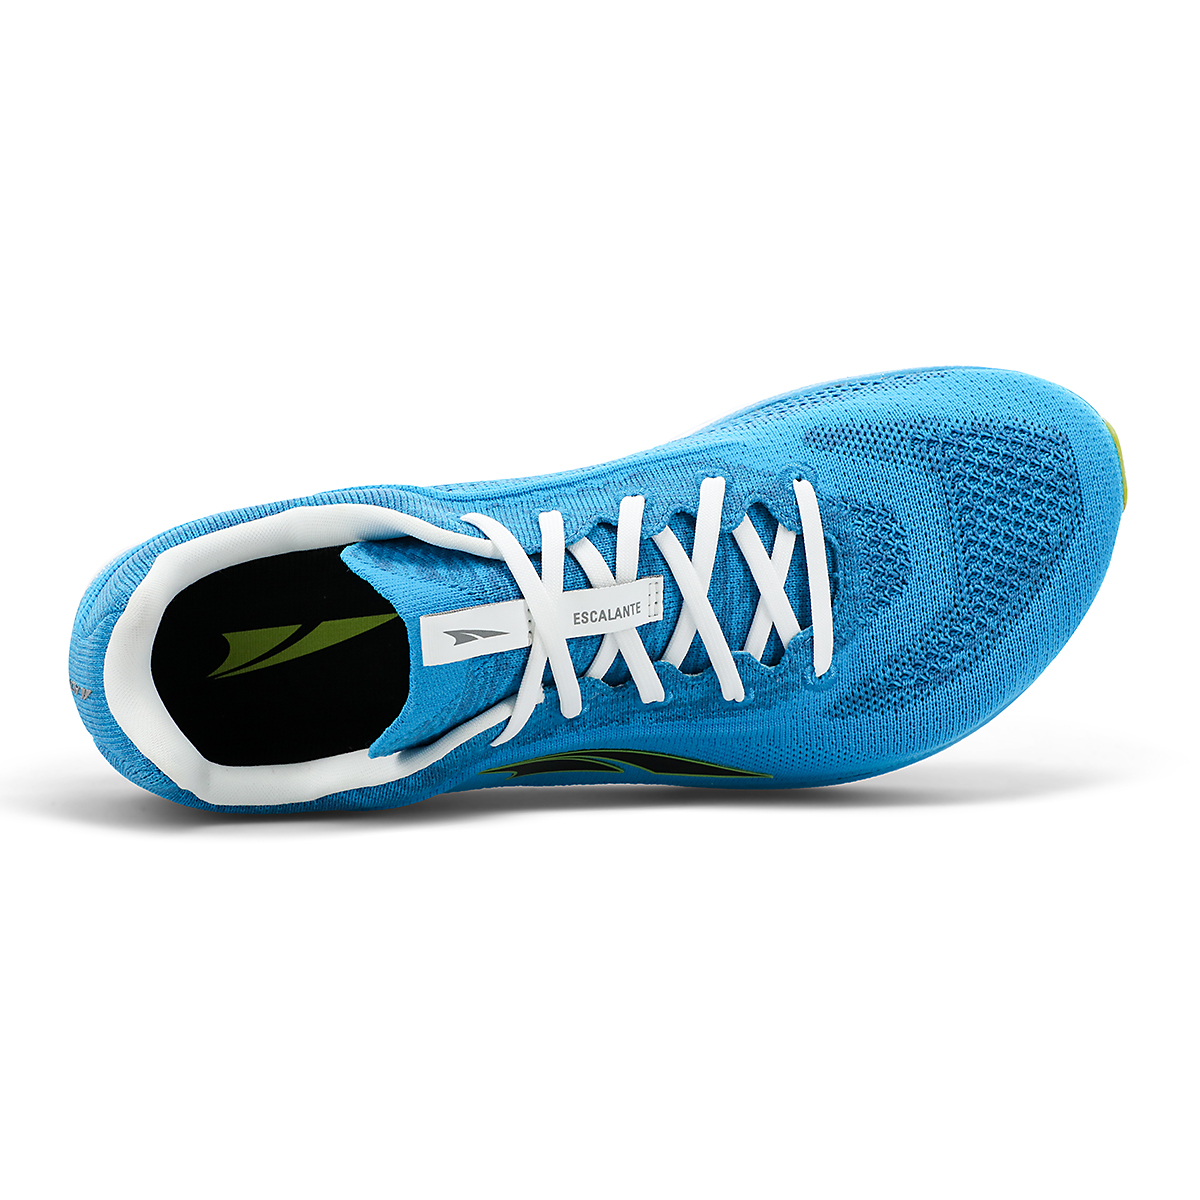 Men's Altra Escalante 2.5 Running Shoe - Color: Blue/Lime - Size: 7 - Width: Regular, Blue/Lime, large, image 3